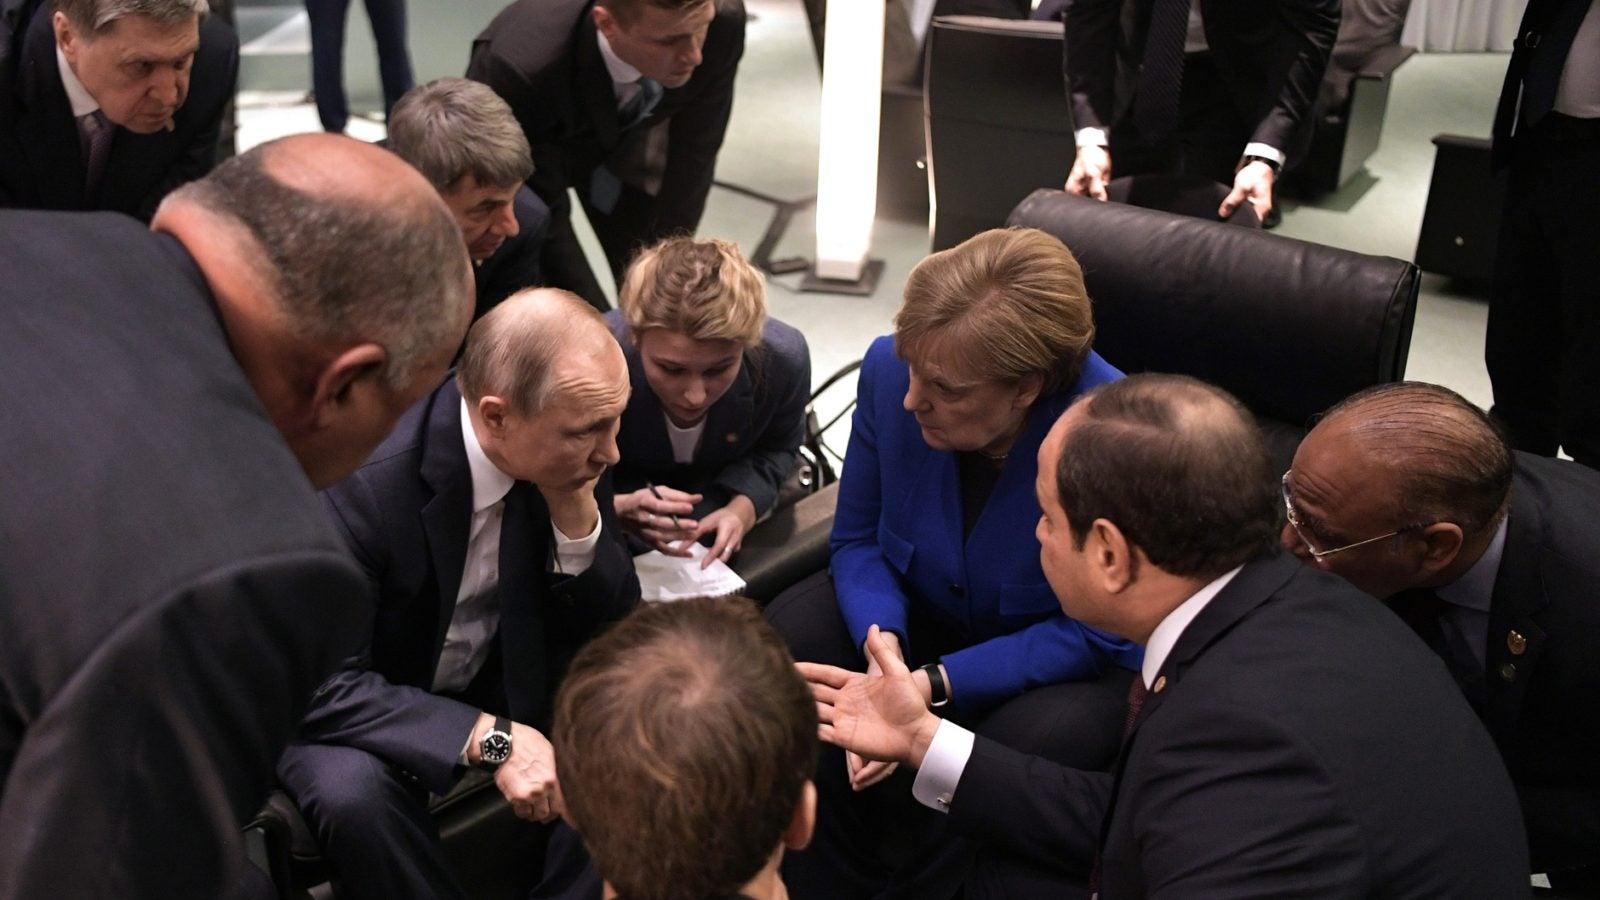 Angela Merkel, Emmanuel Macron, Vladimir Putin, and Abdel Fattah el-Sisi sit with their heads together.